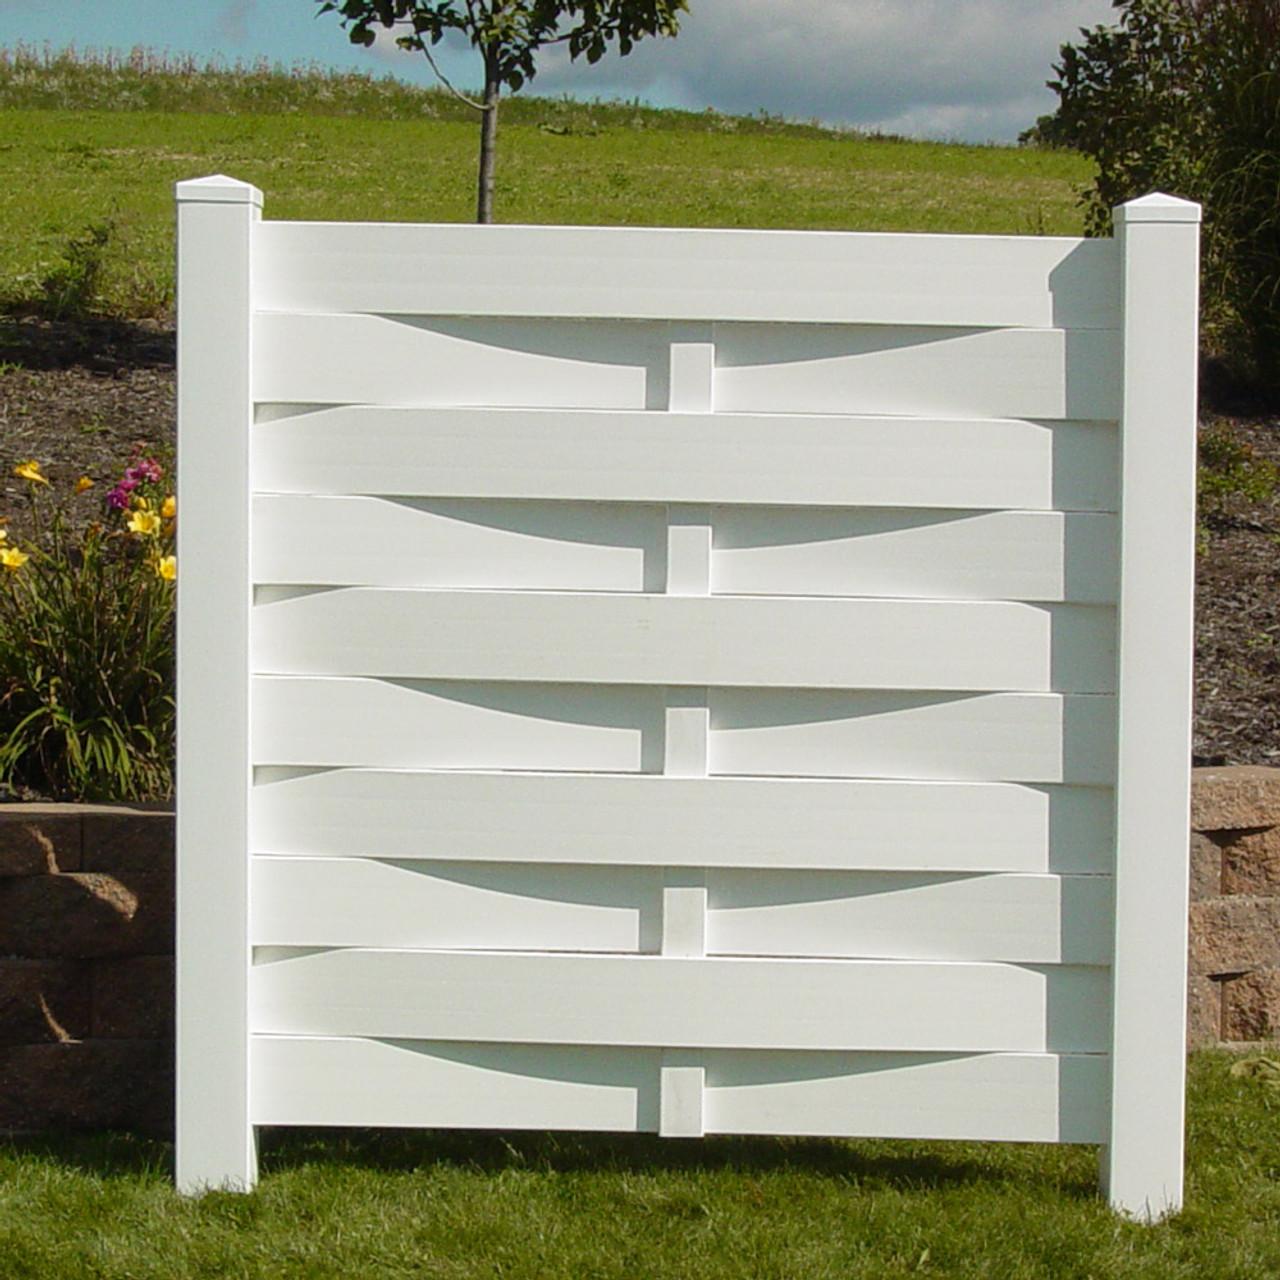 Basket Weave Vinyl Privacy Fence - Kauffman Lawn Furniture